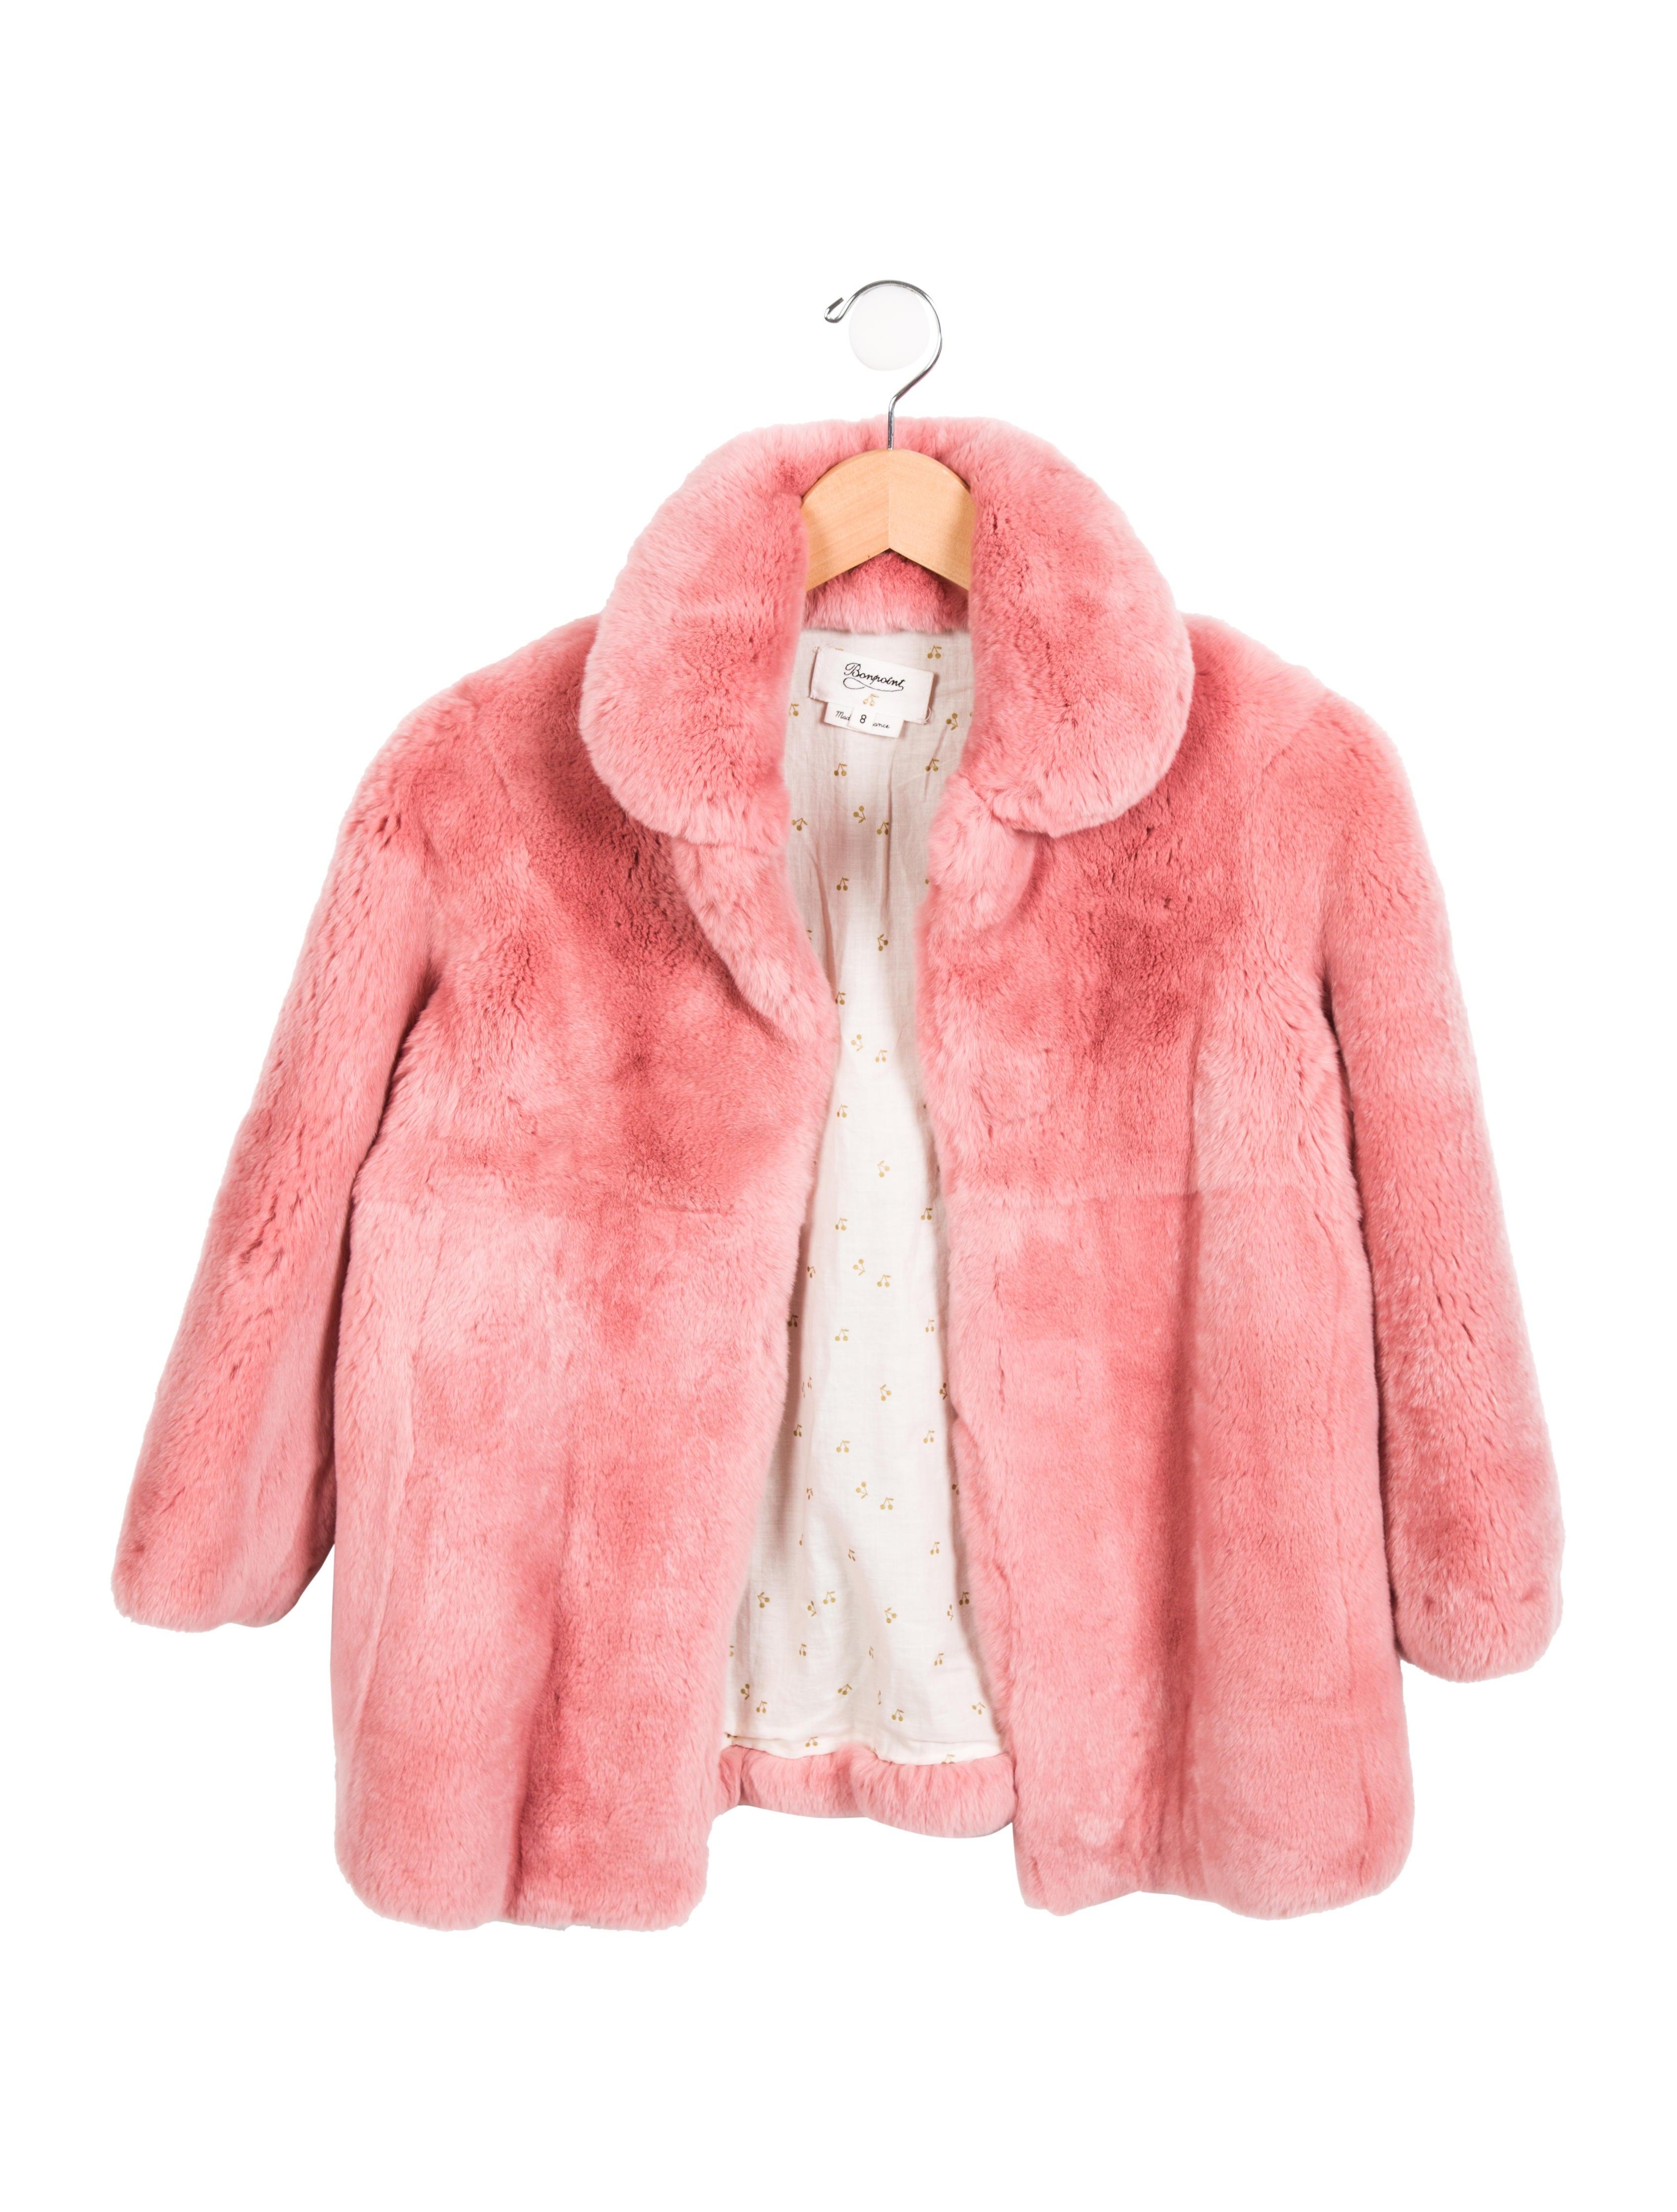 ba70c7ab8519f Ermanno Scervino Girls Pink Classic Wool Coat Children Boutique